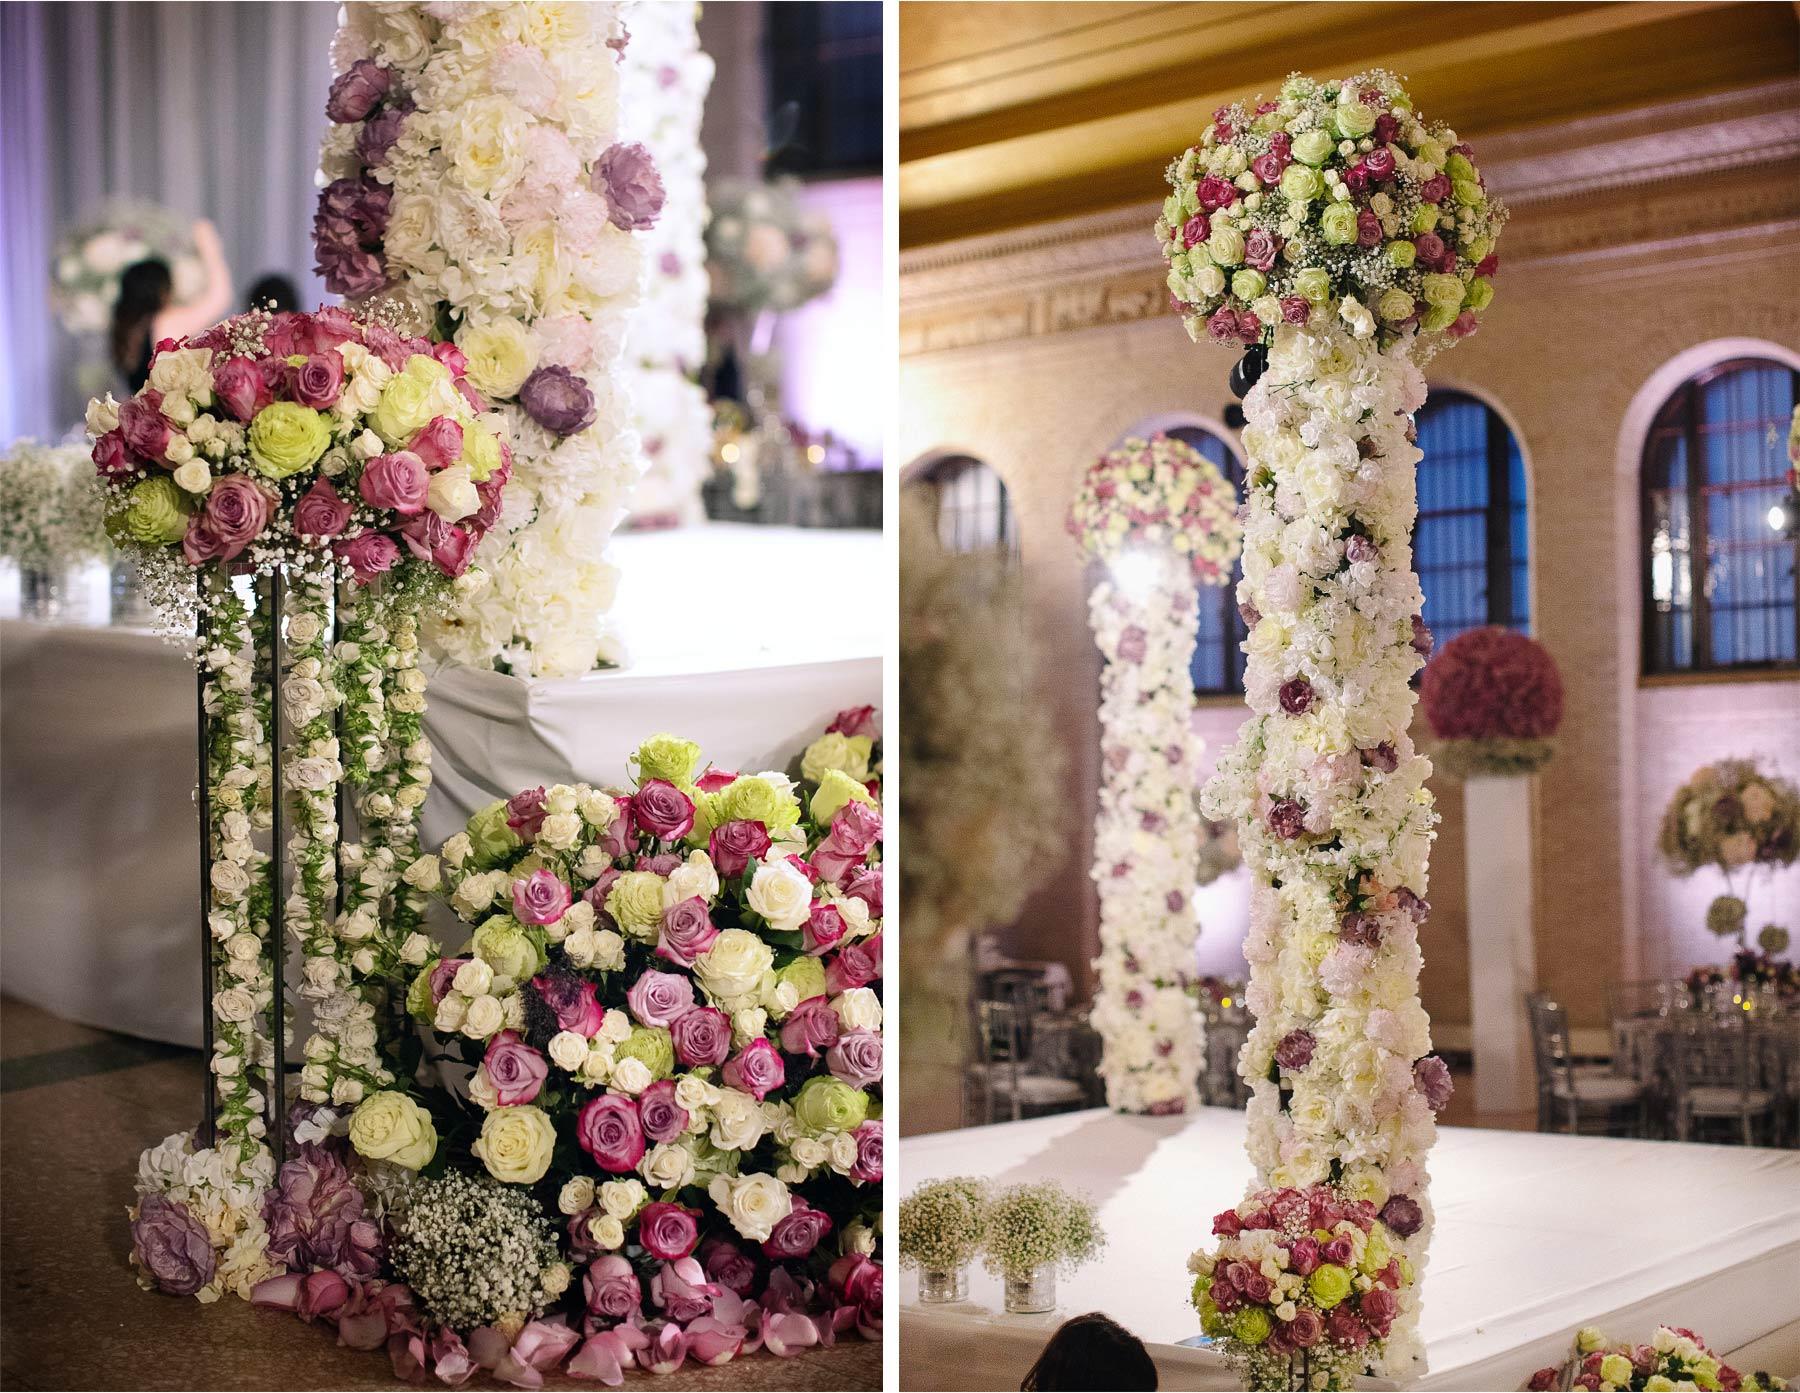 07-Andrew-Vick-Photography-My-Great-Big-Live-Wedding-with-David-Tutera-Behind-the-Scenes-Minnesota-Union-Depot-Saint-Paul-Flowers-Flower-Balls-Ceremony.jpg